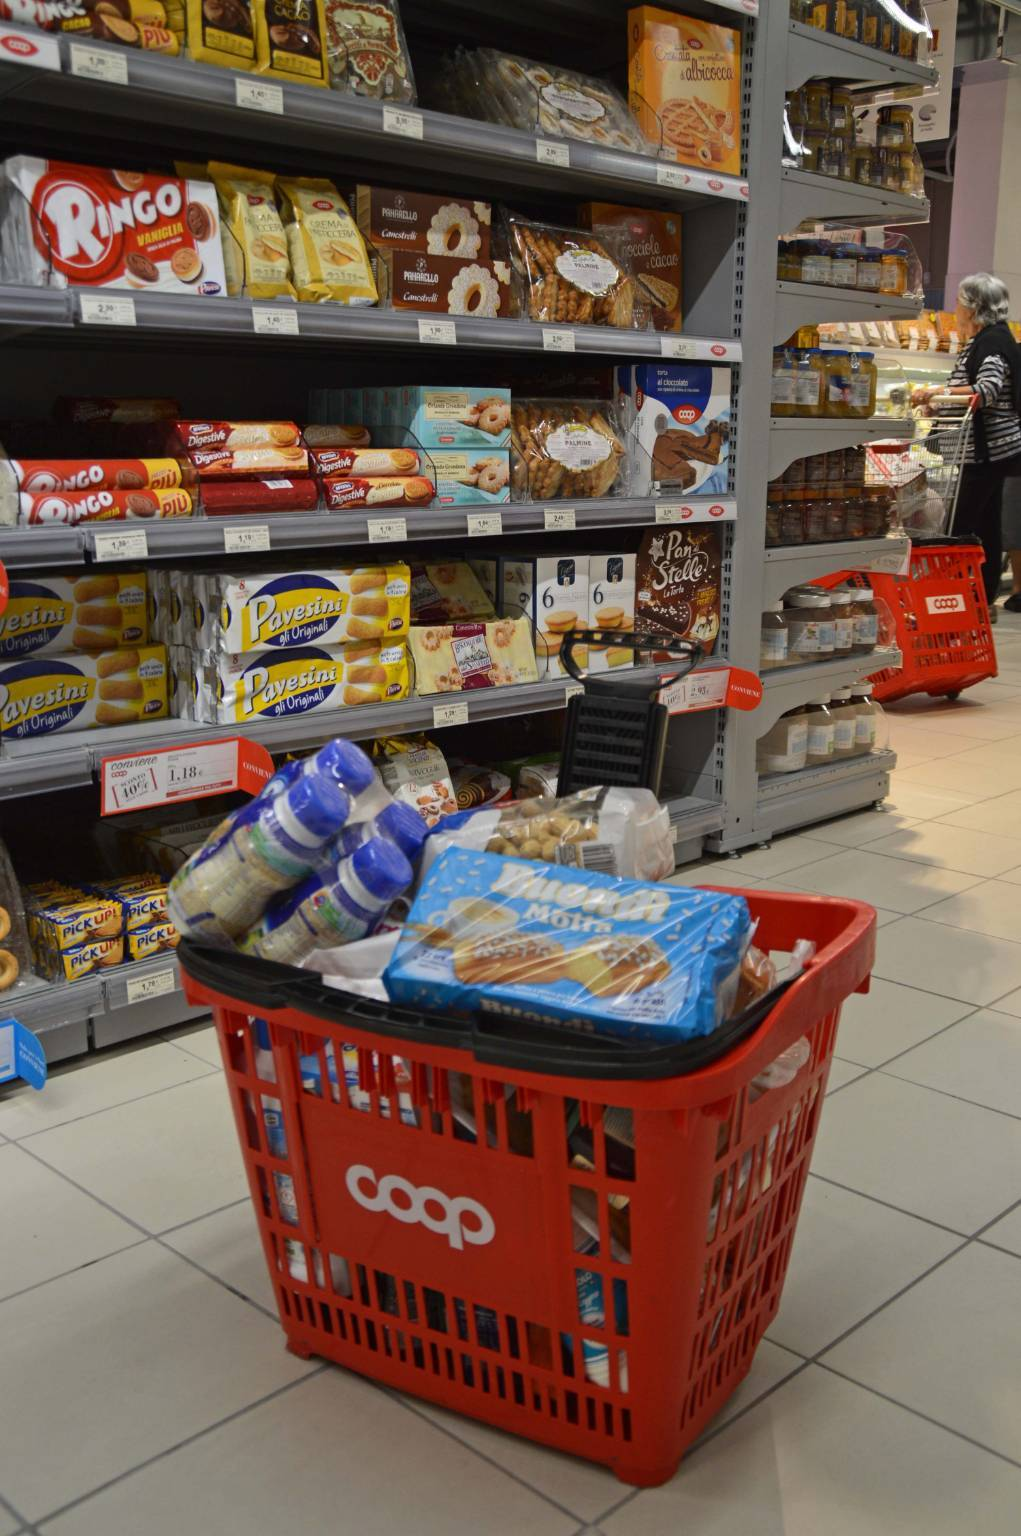 Coop Liguria Supermercato